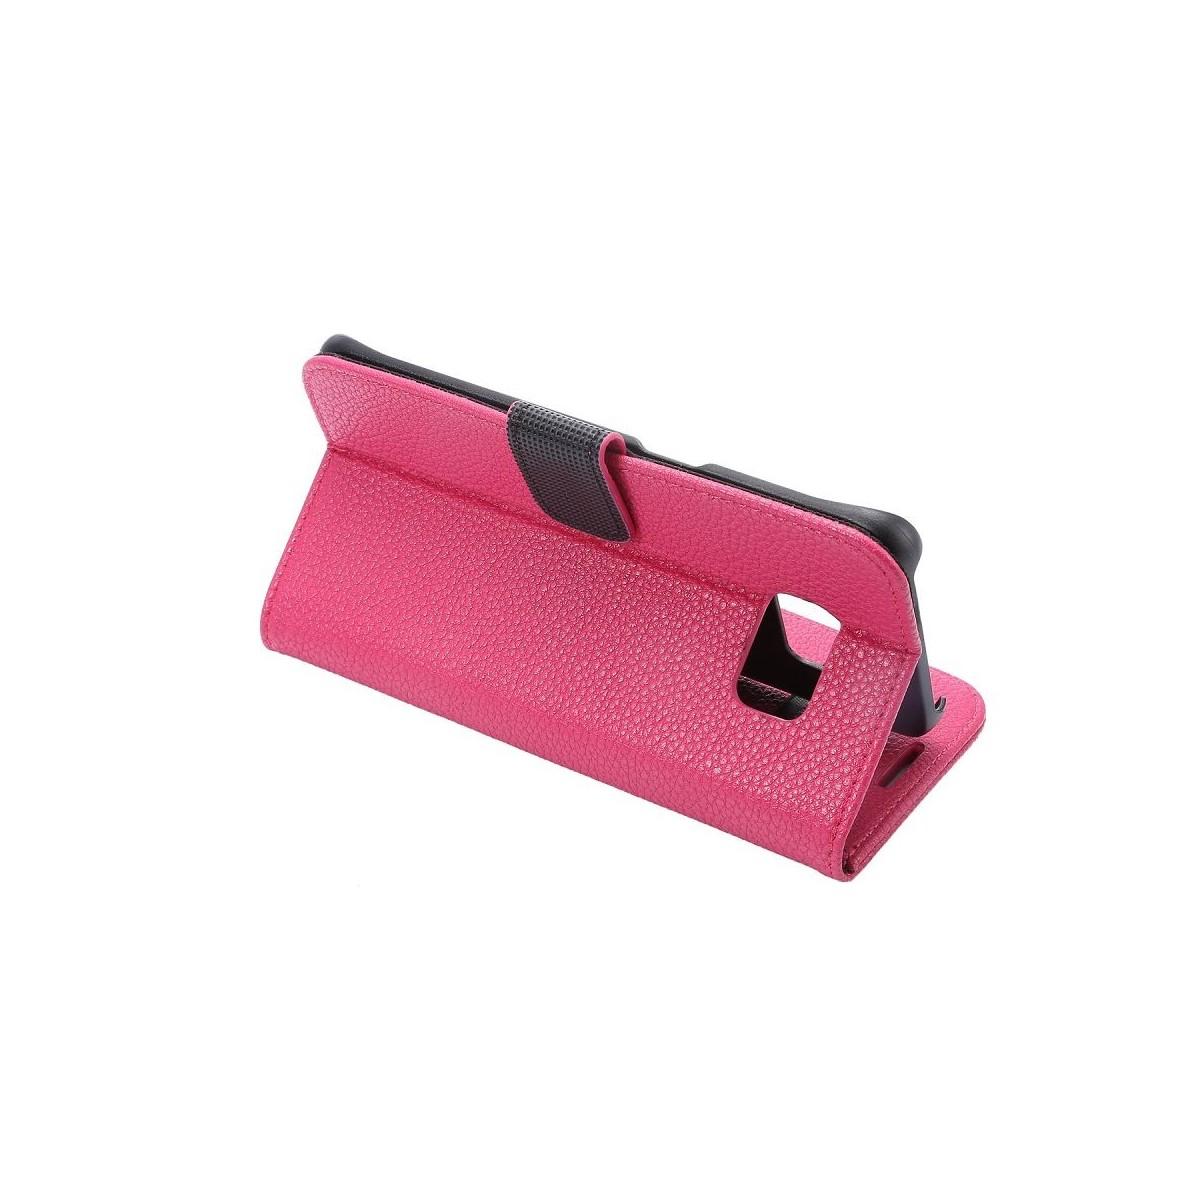 Etui Galaxy S7 Edge Portecarte Rose - Crazy Kase